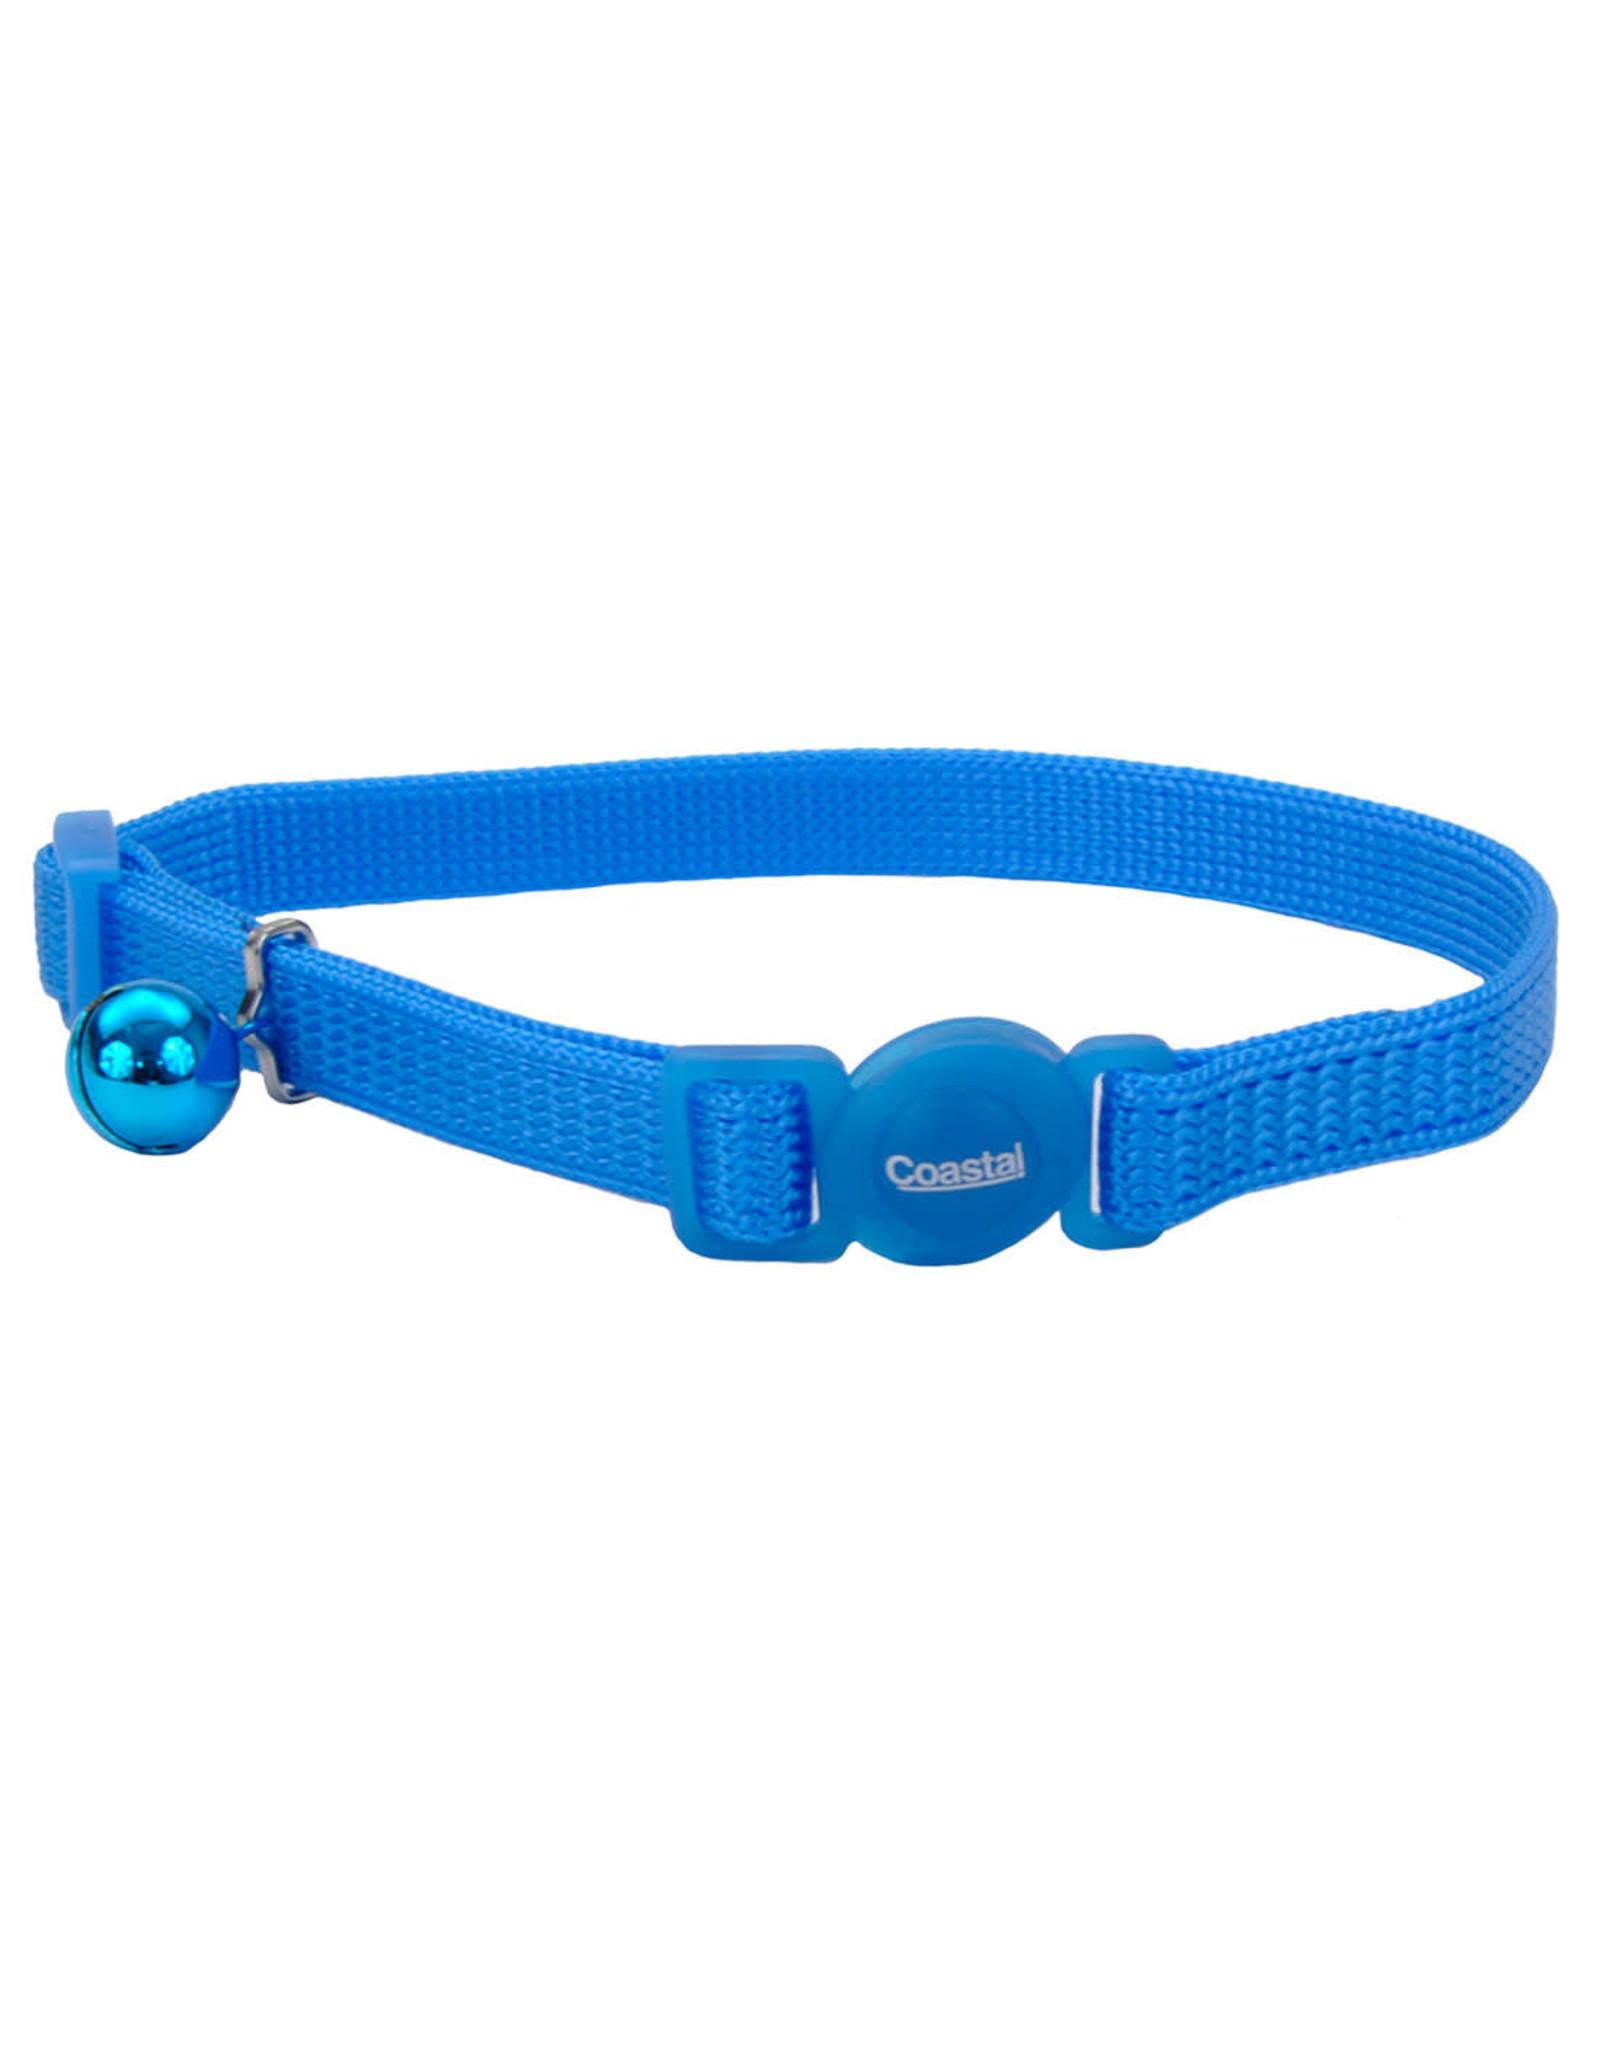 "Coastal Pet Products Coastal Safe Cat Snag-Proof Breakaway Collar 3/8"""